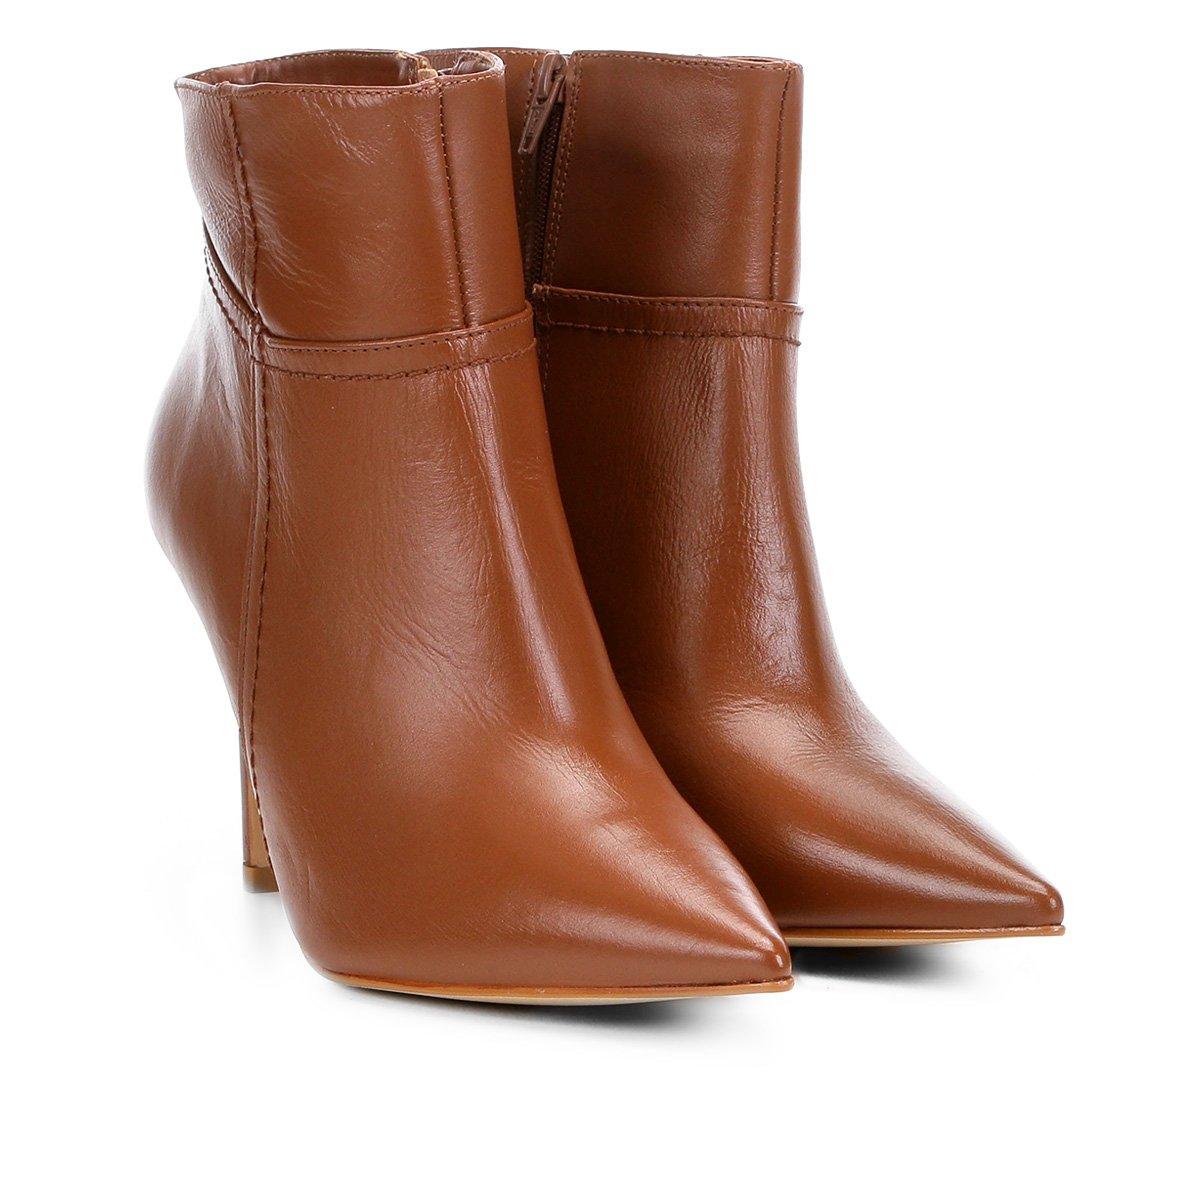 12e23ed0b Bota Couro Cano Curto Shoestock Básica Bico Fino Feminina